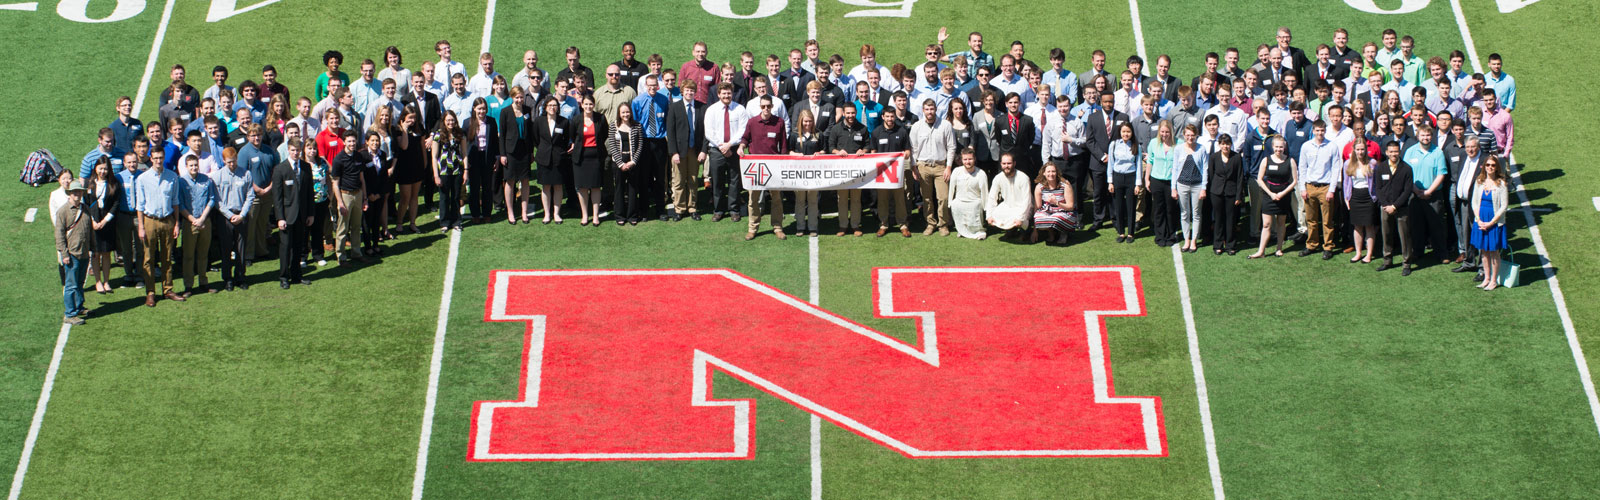 Senior Design Showcase participants take a photo at the 50-yard line of Memorial Stadium in Lincoln, Nebraska.